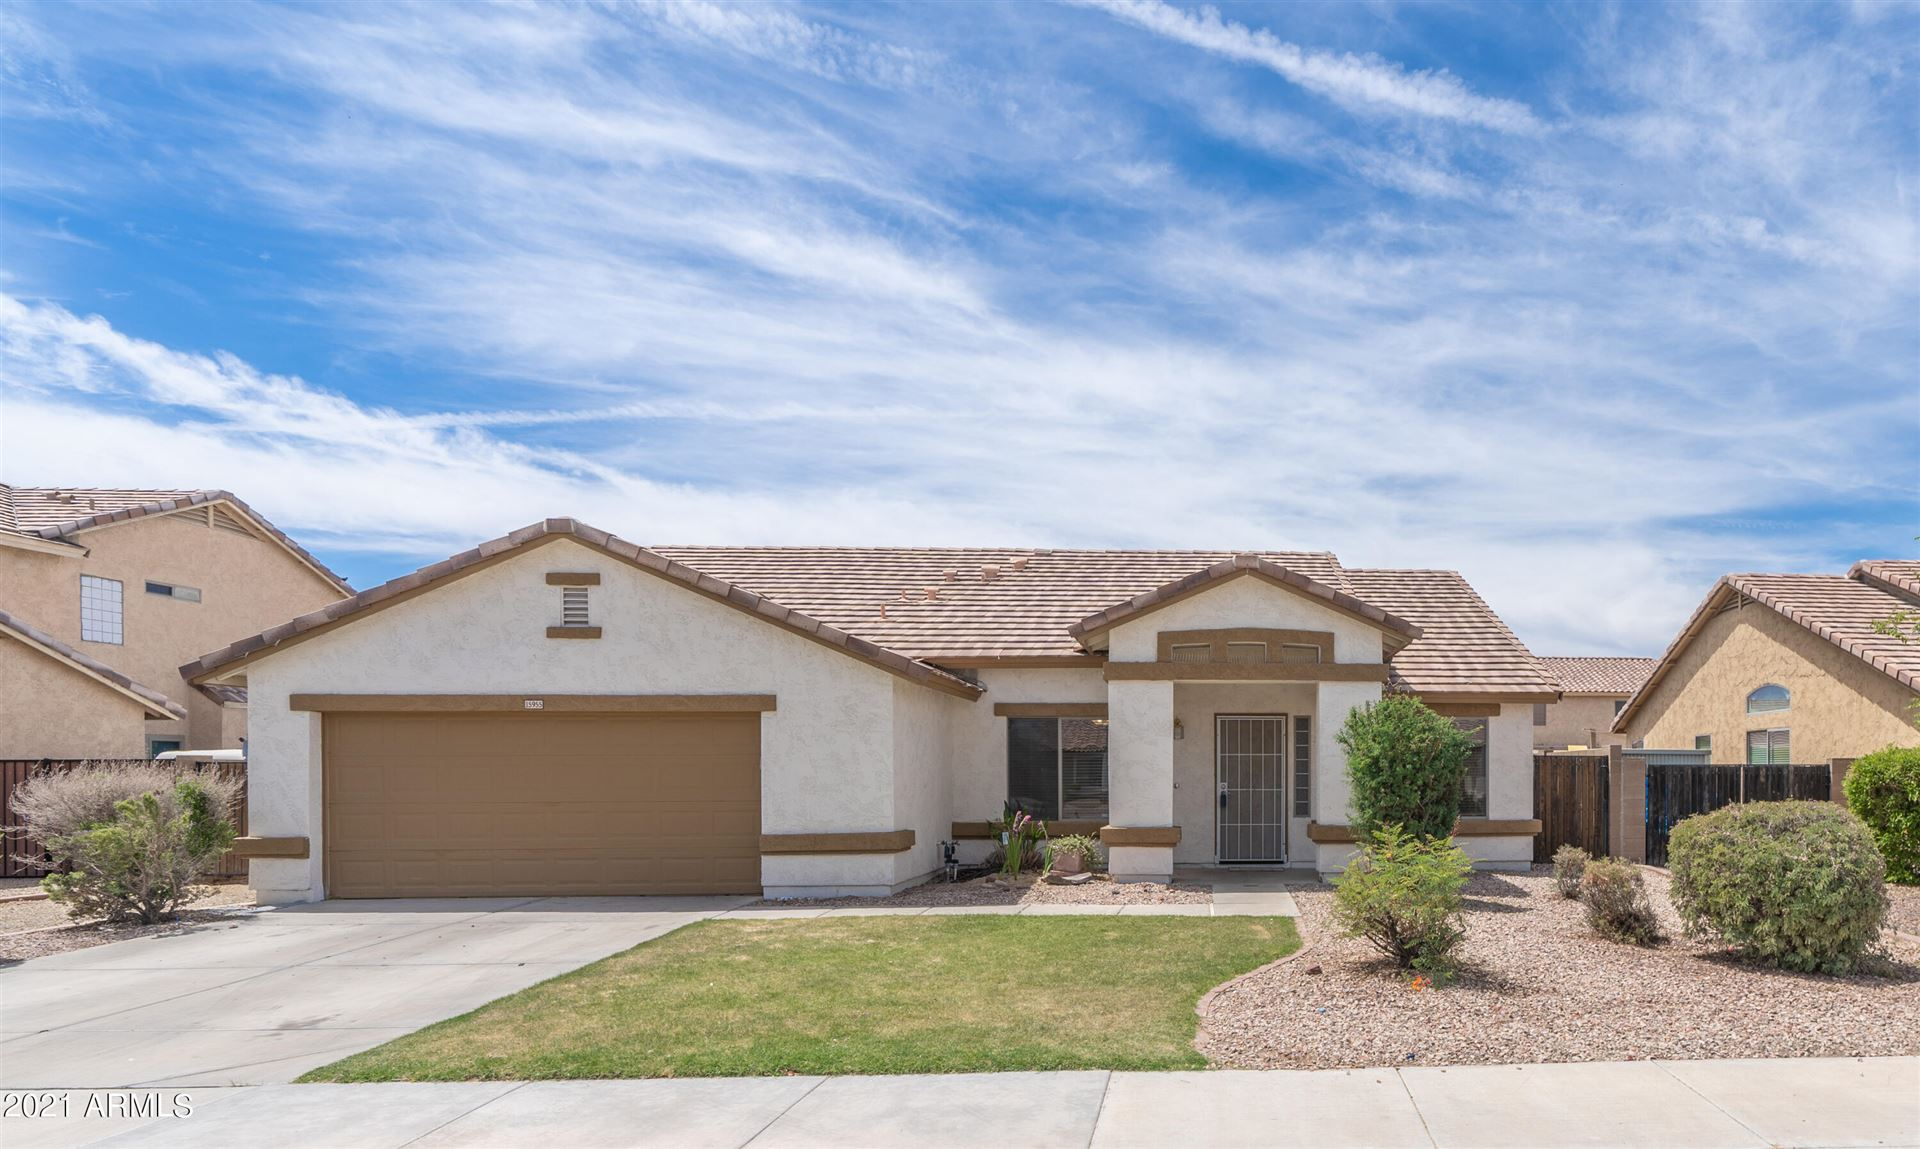 Photo of 15955 W ADAMS Street, Goodyear, AZ 85338 (MLS # 6245762)